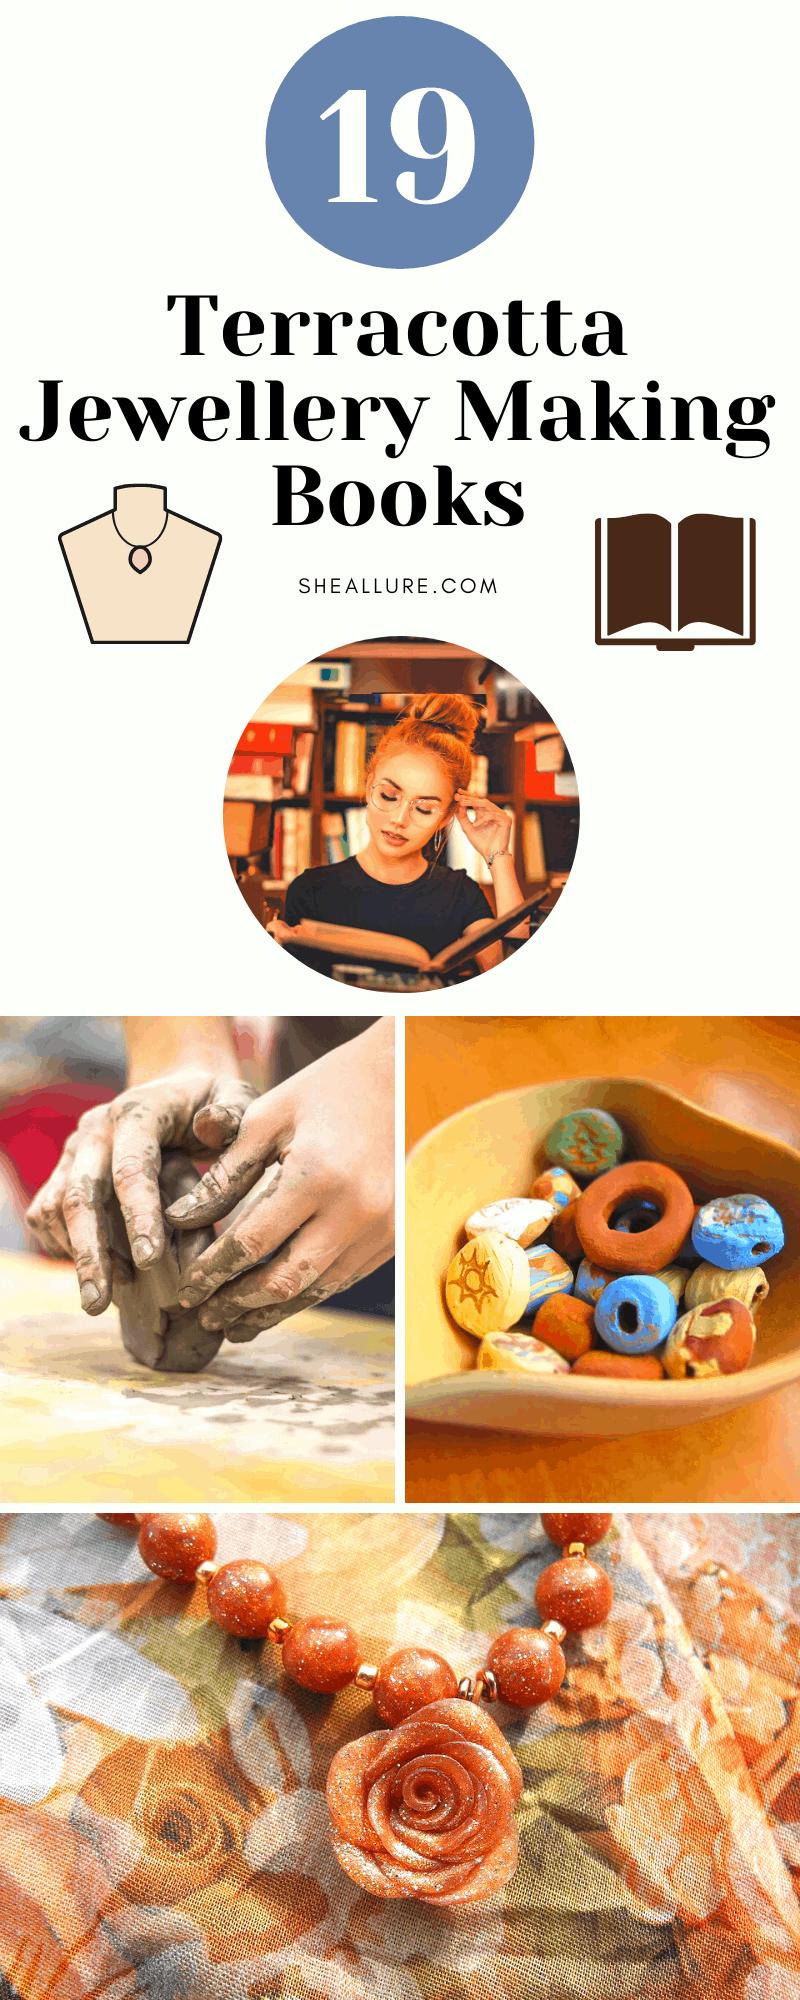 Terracotta Jewellery Making Books